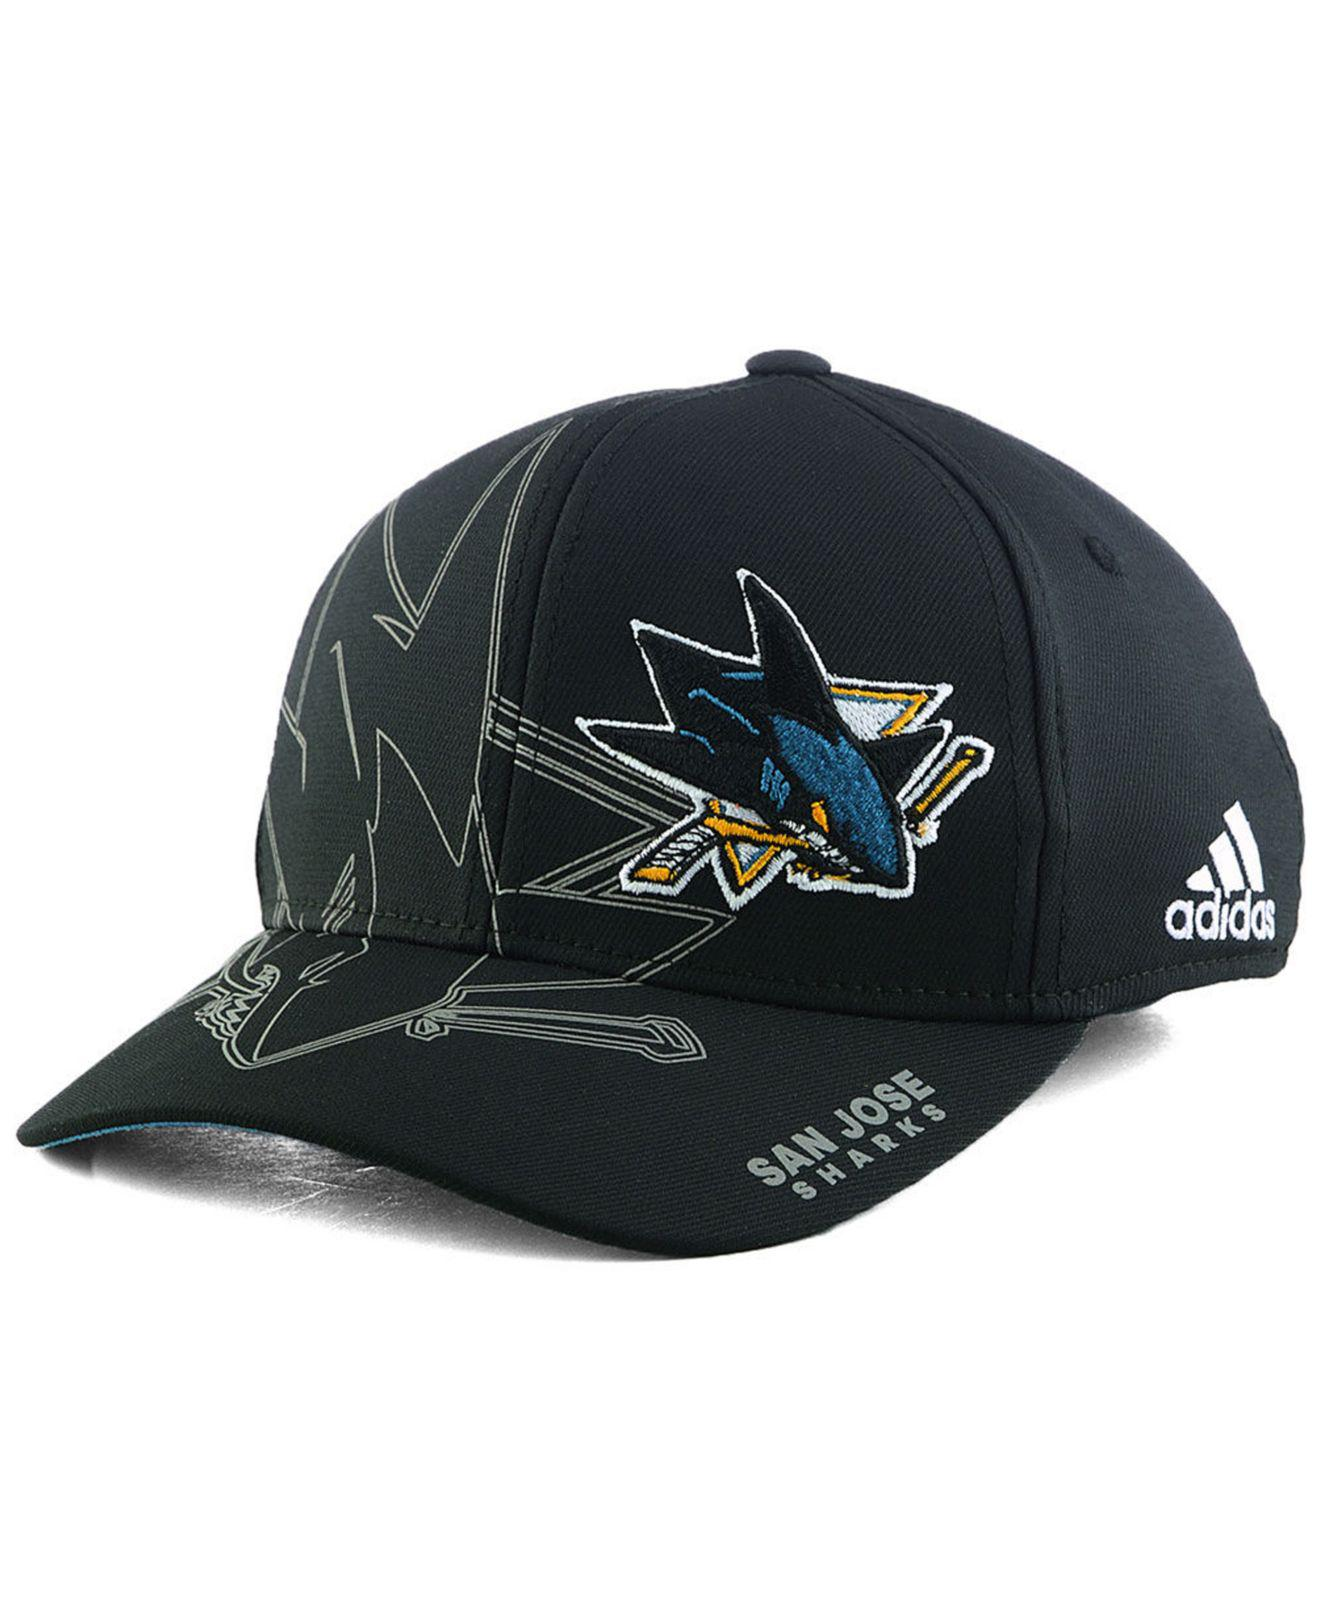 5953f7c8eafe8 Lyst - adidas San Jose Sharks 2nd Season Flex Cap in Black for Men